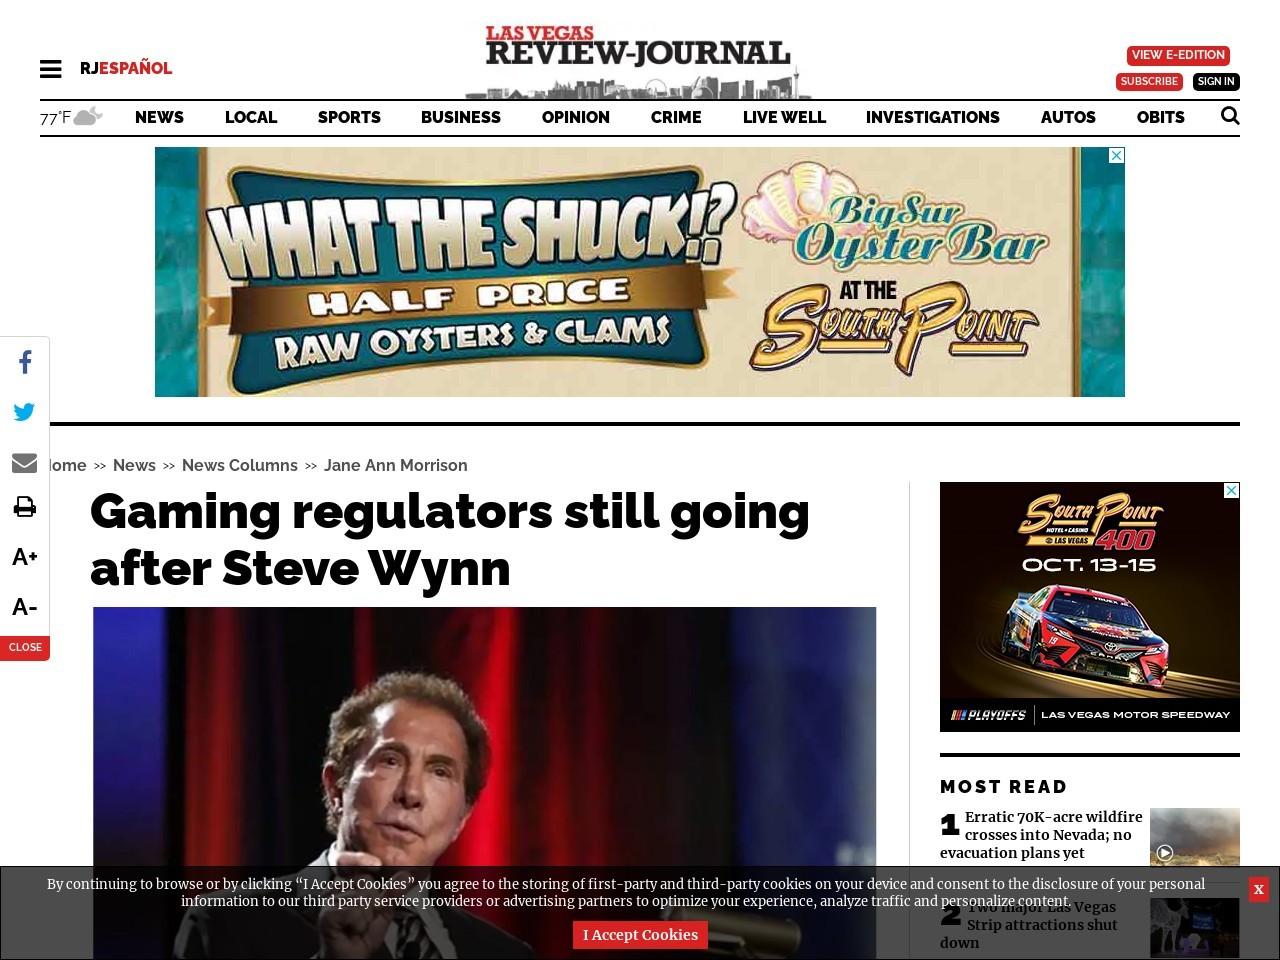 Gaming regulators still going after Steve Wynn